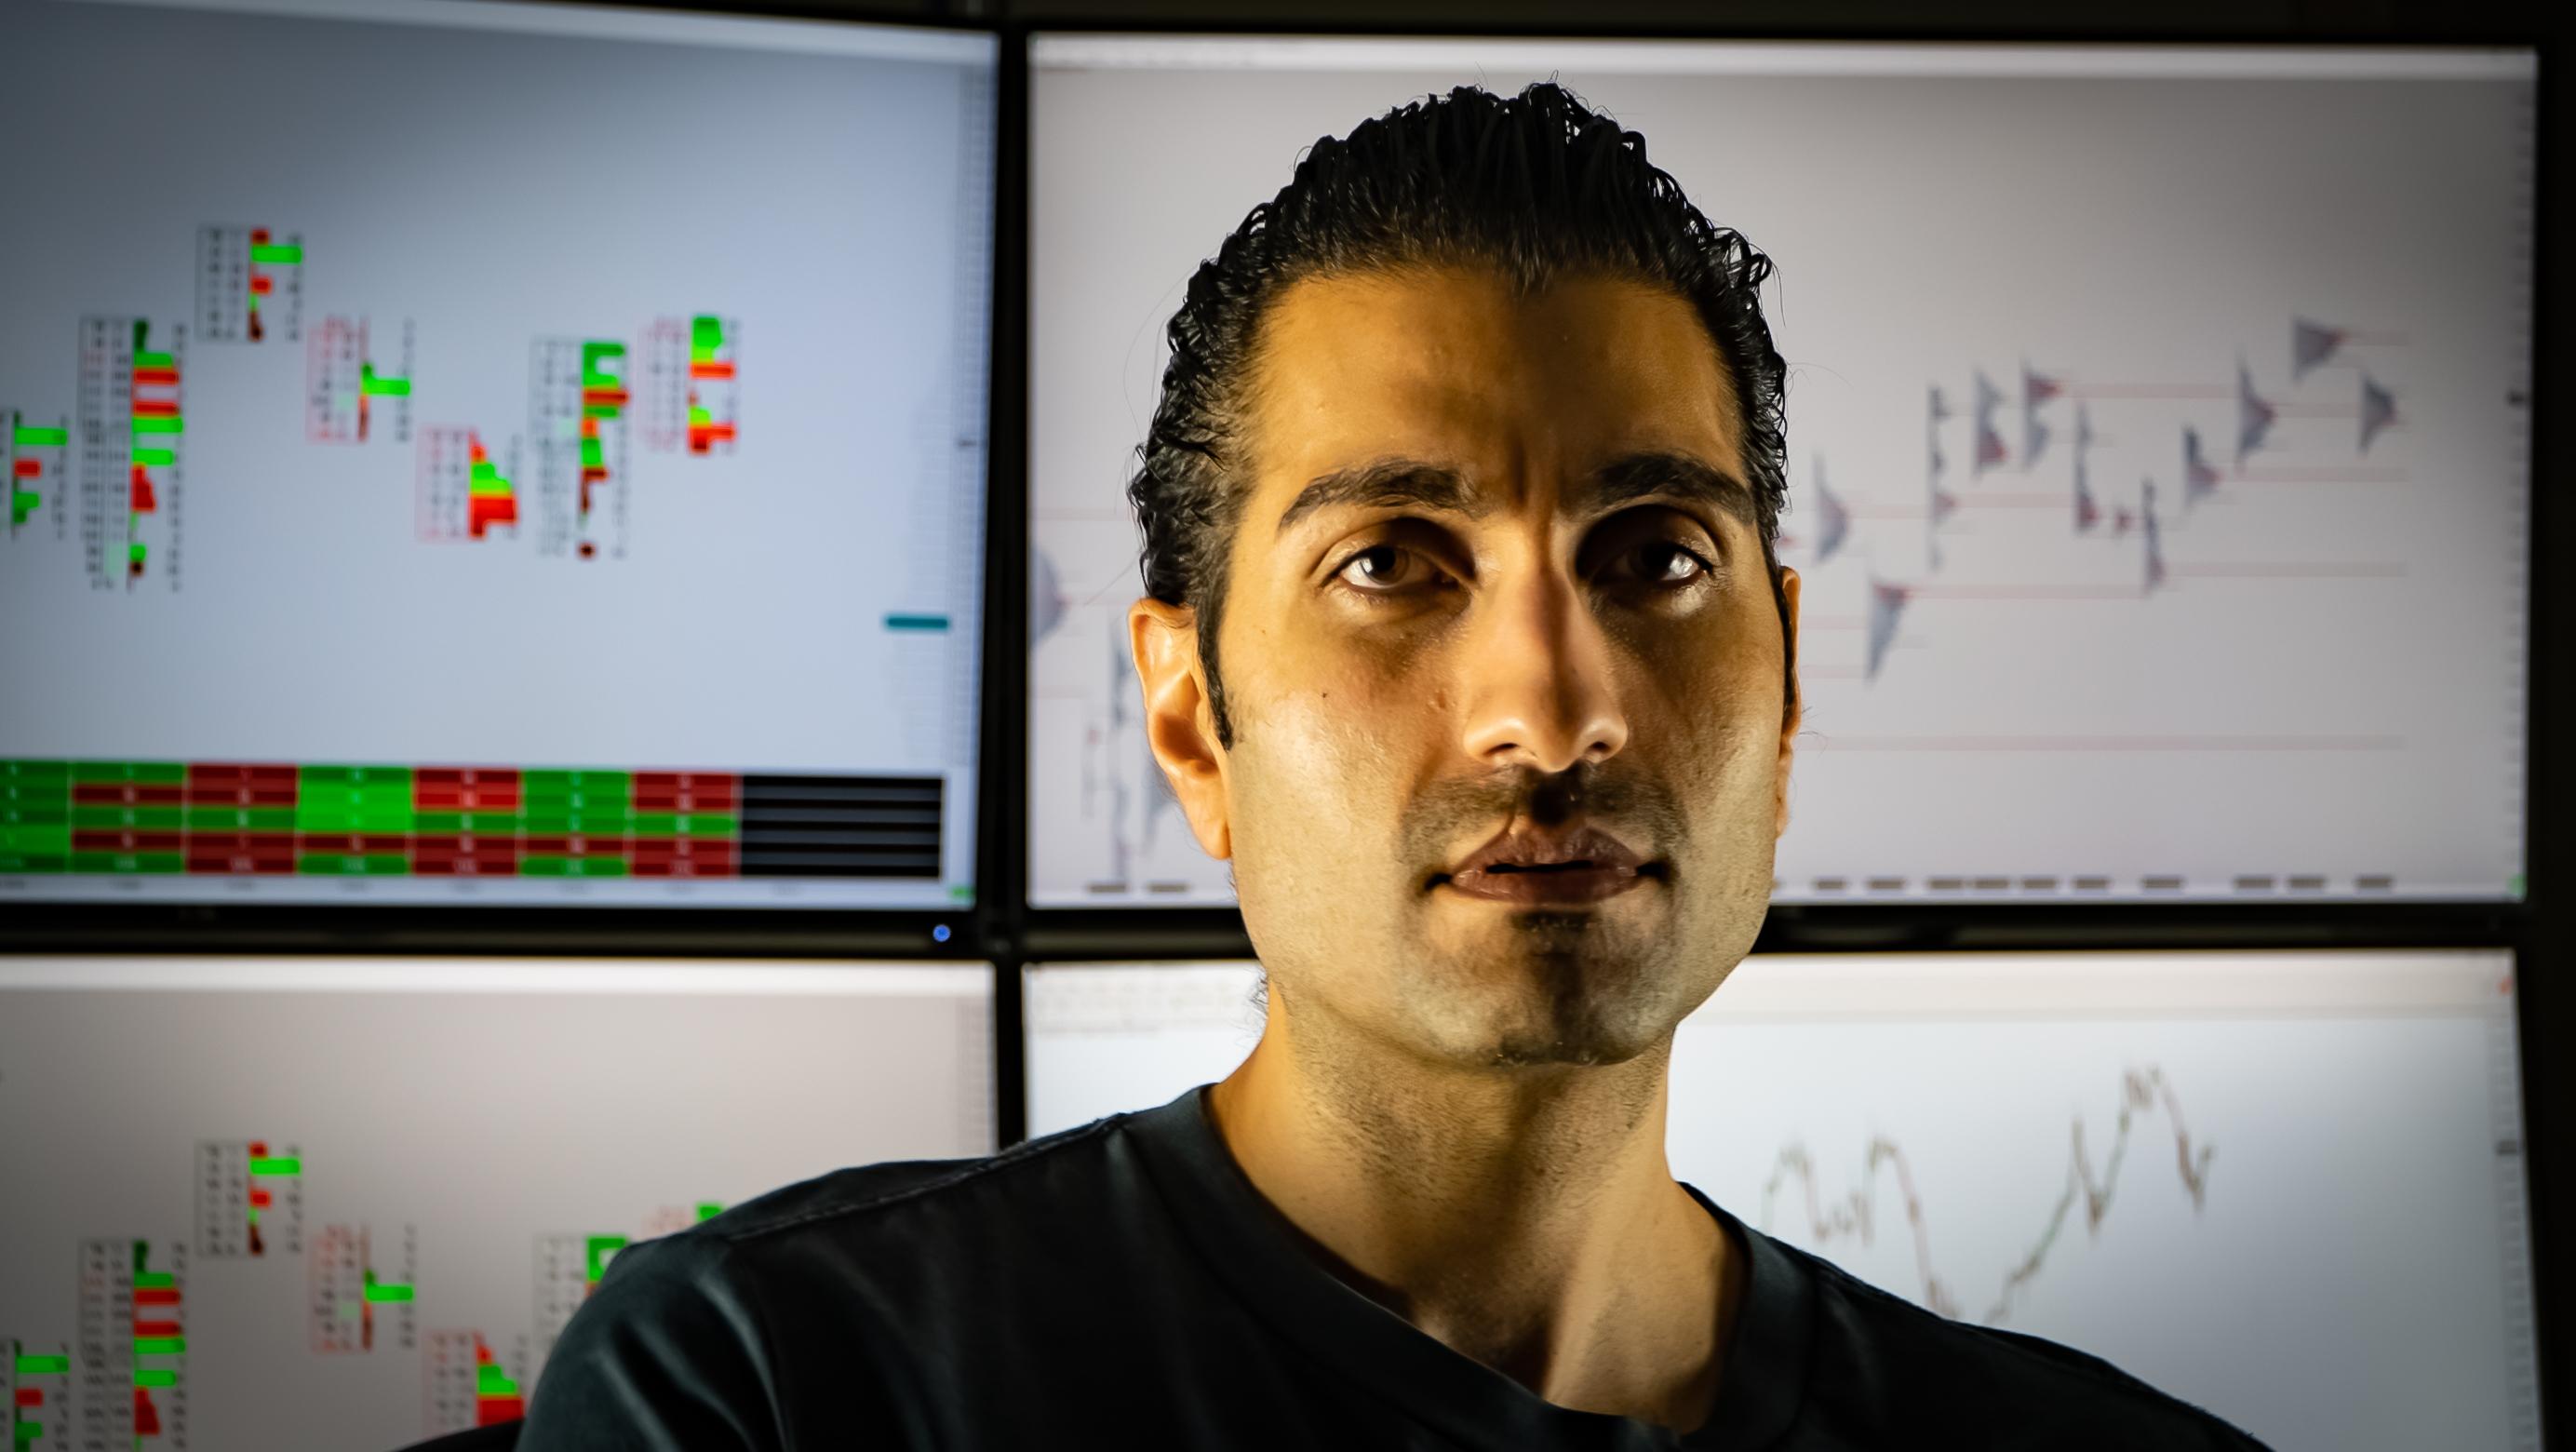 Portrait of Neerav Vadera